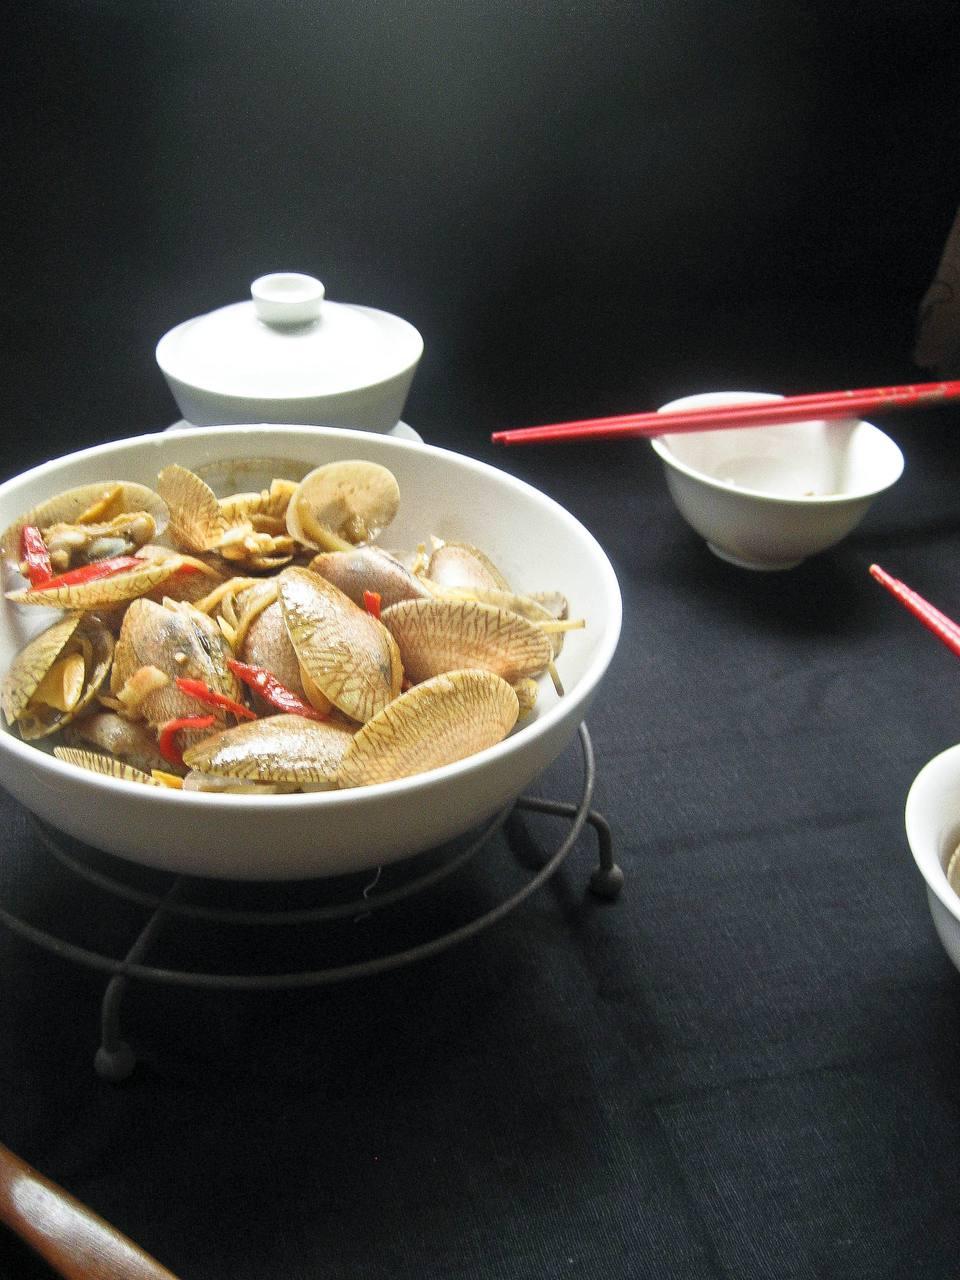 Stir-fried bamboo clams in bean sauce